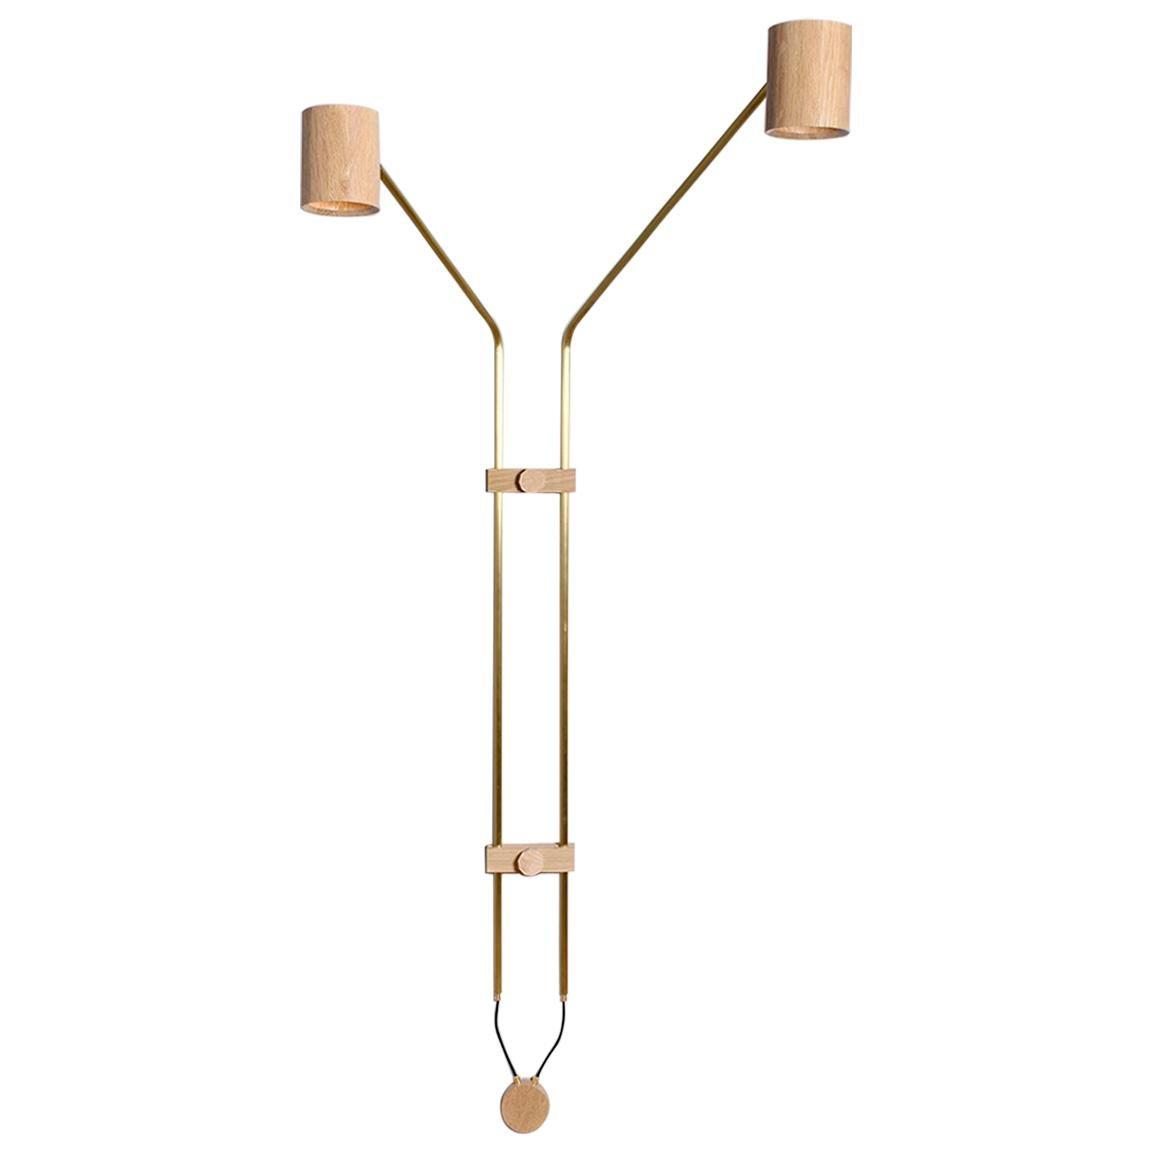 Brass 2 Spot Wall Lamp by ASAF Weinbroom Studio